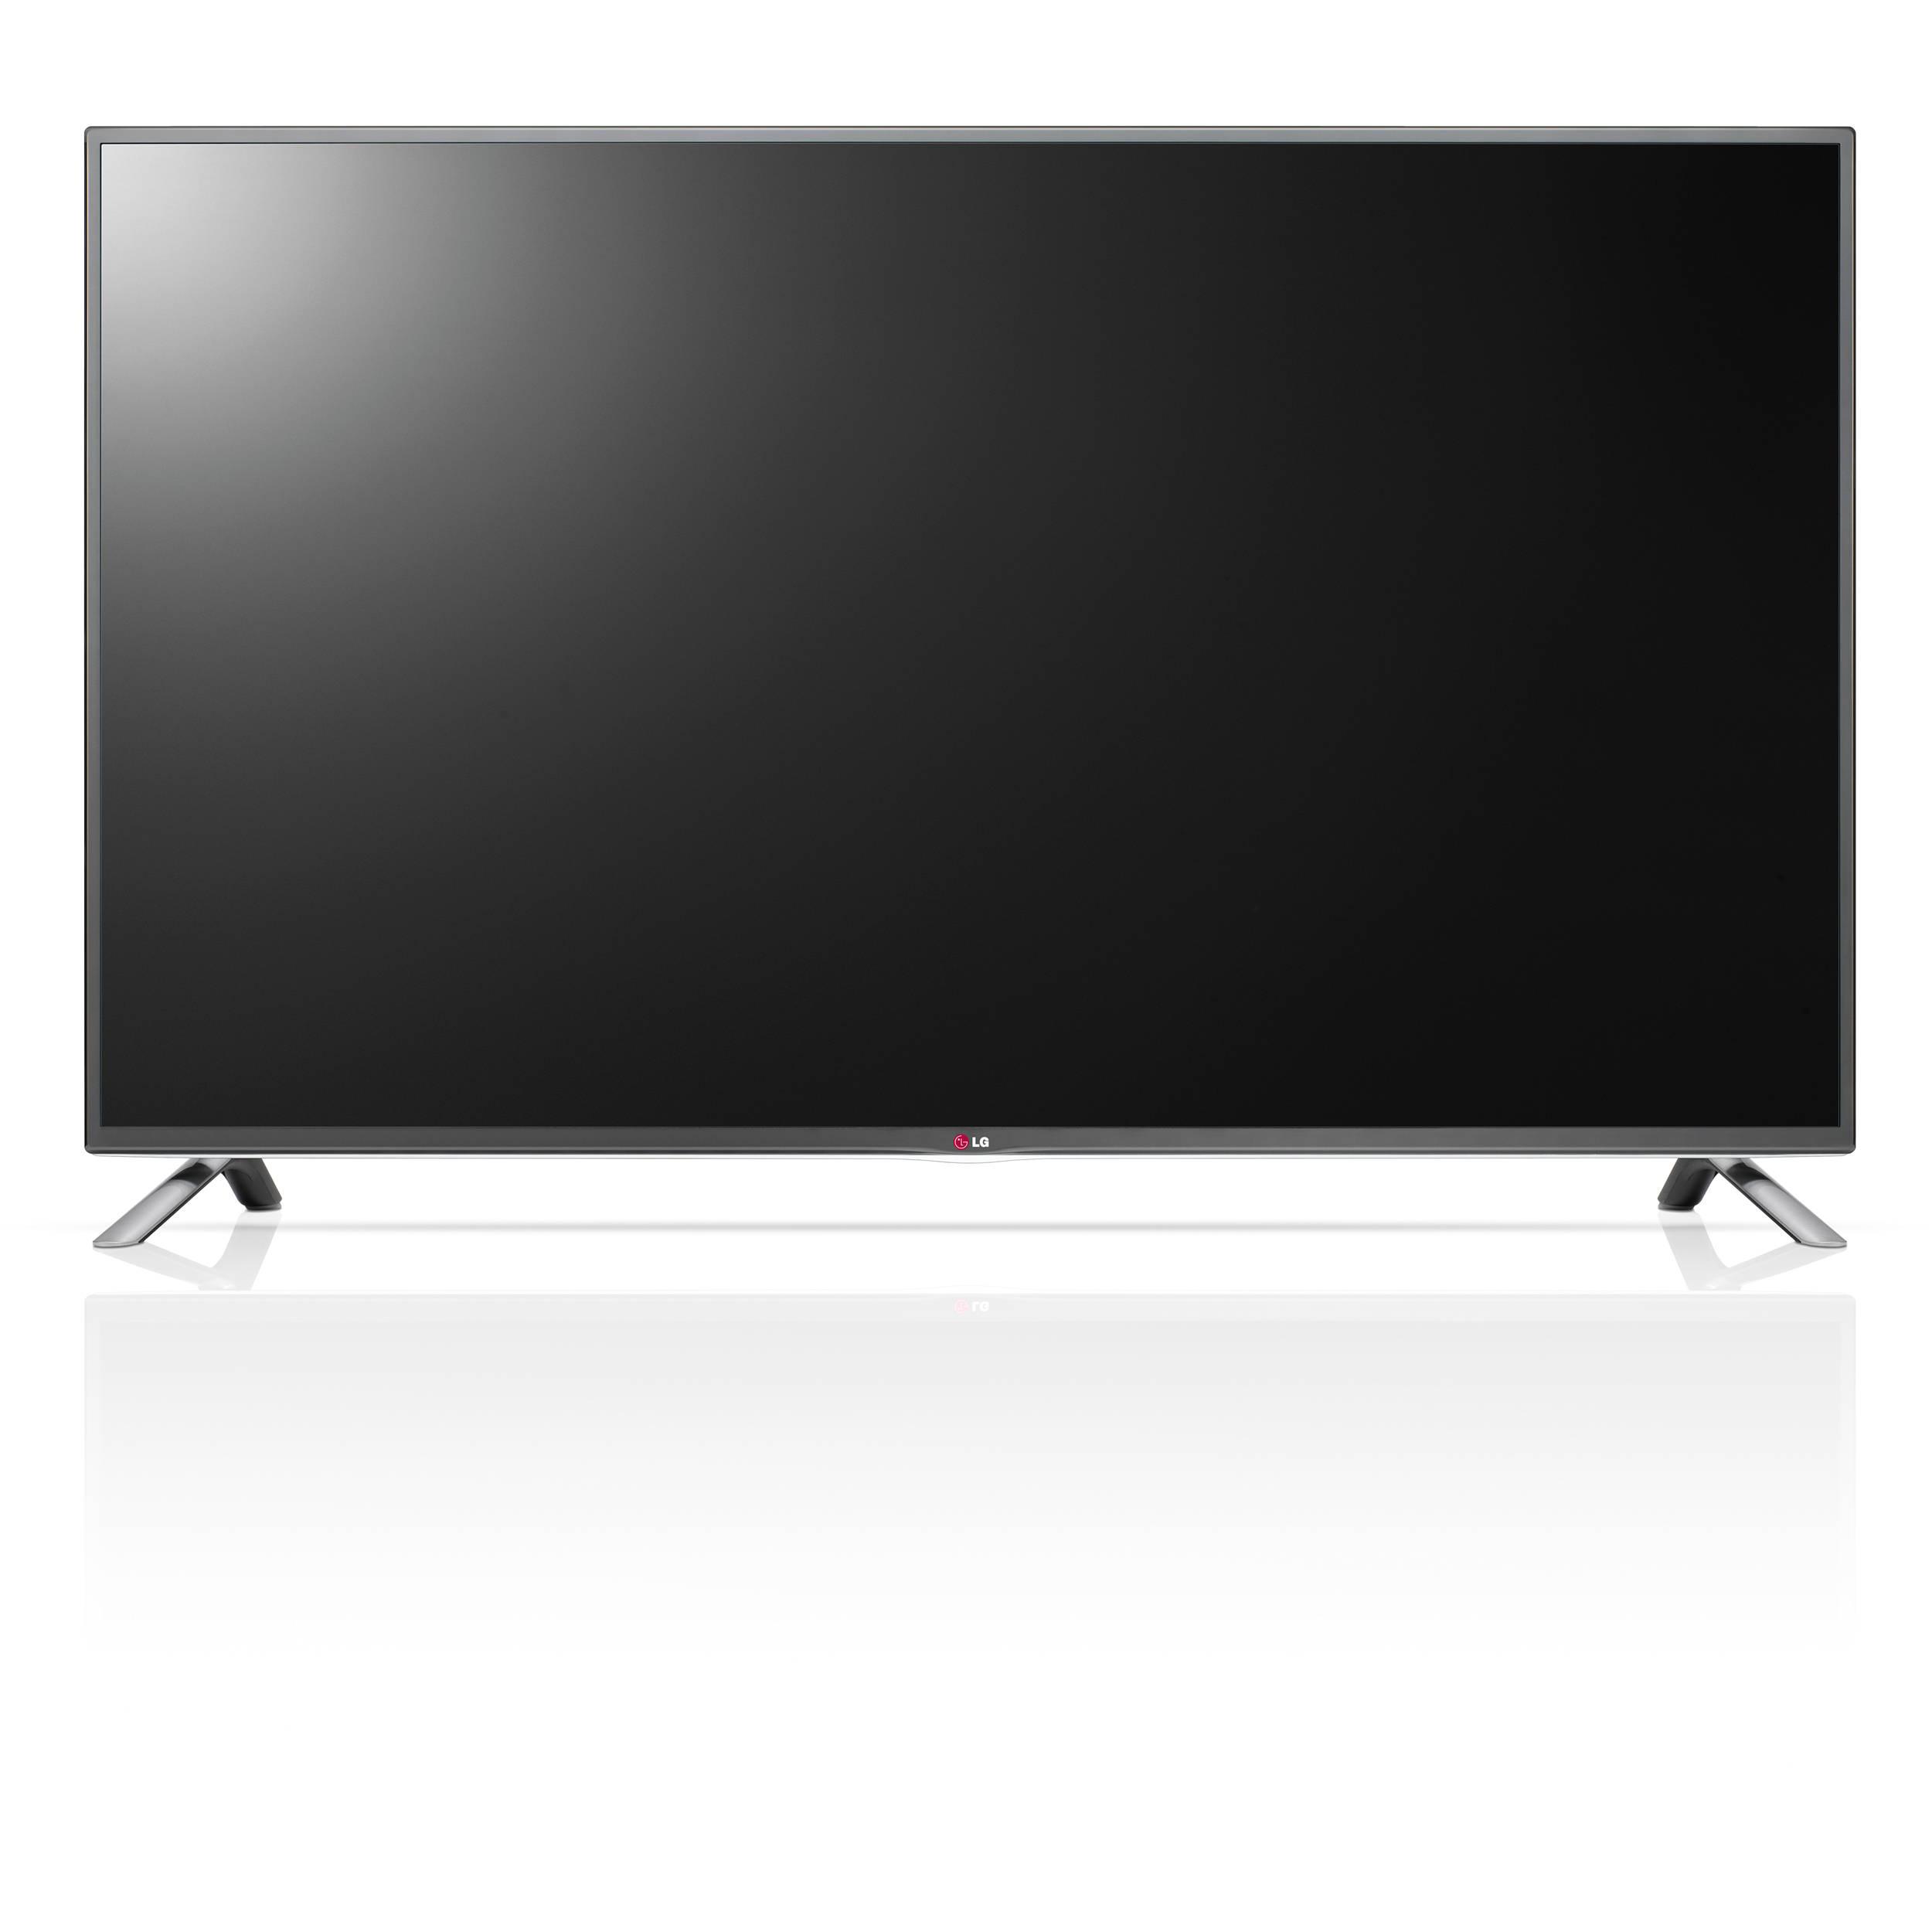 lg tv 60. lg lb6300 series 60\ lg tv 60